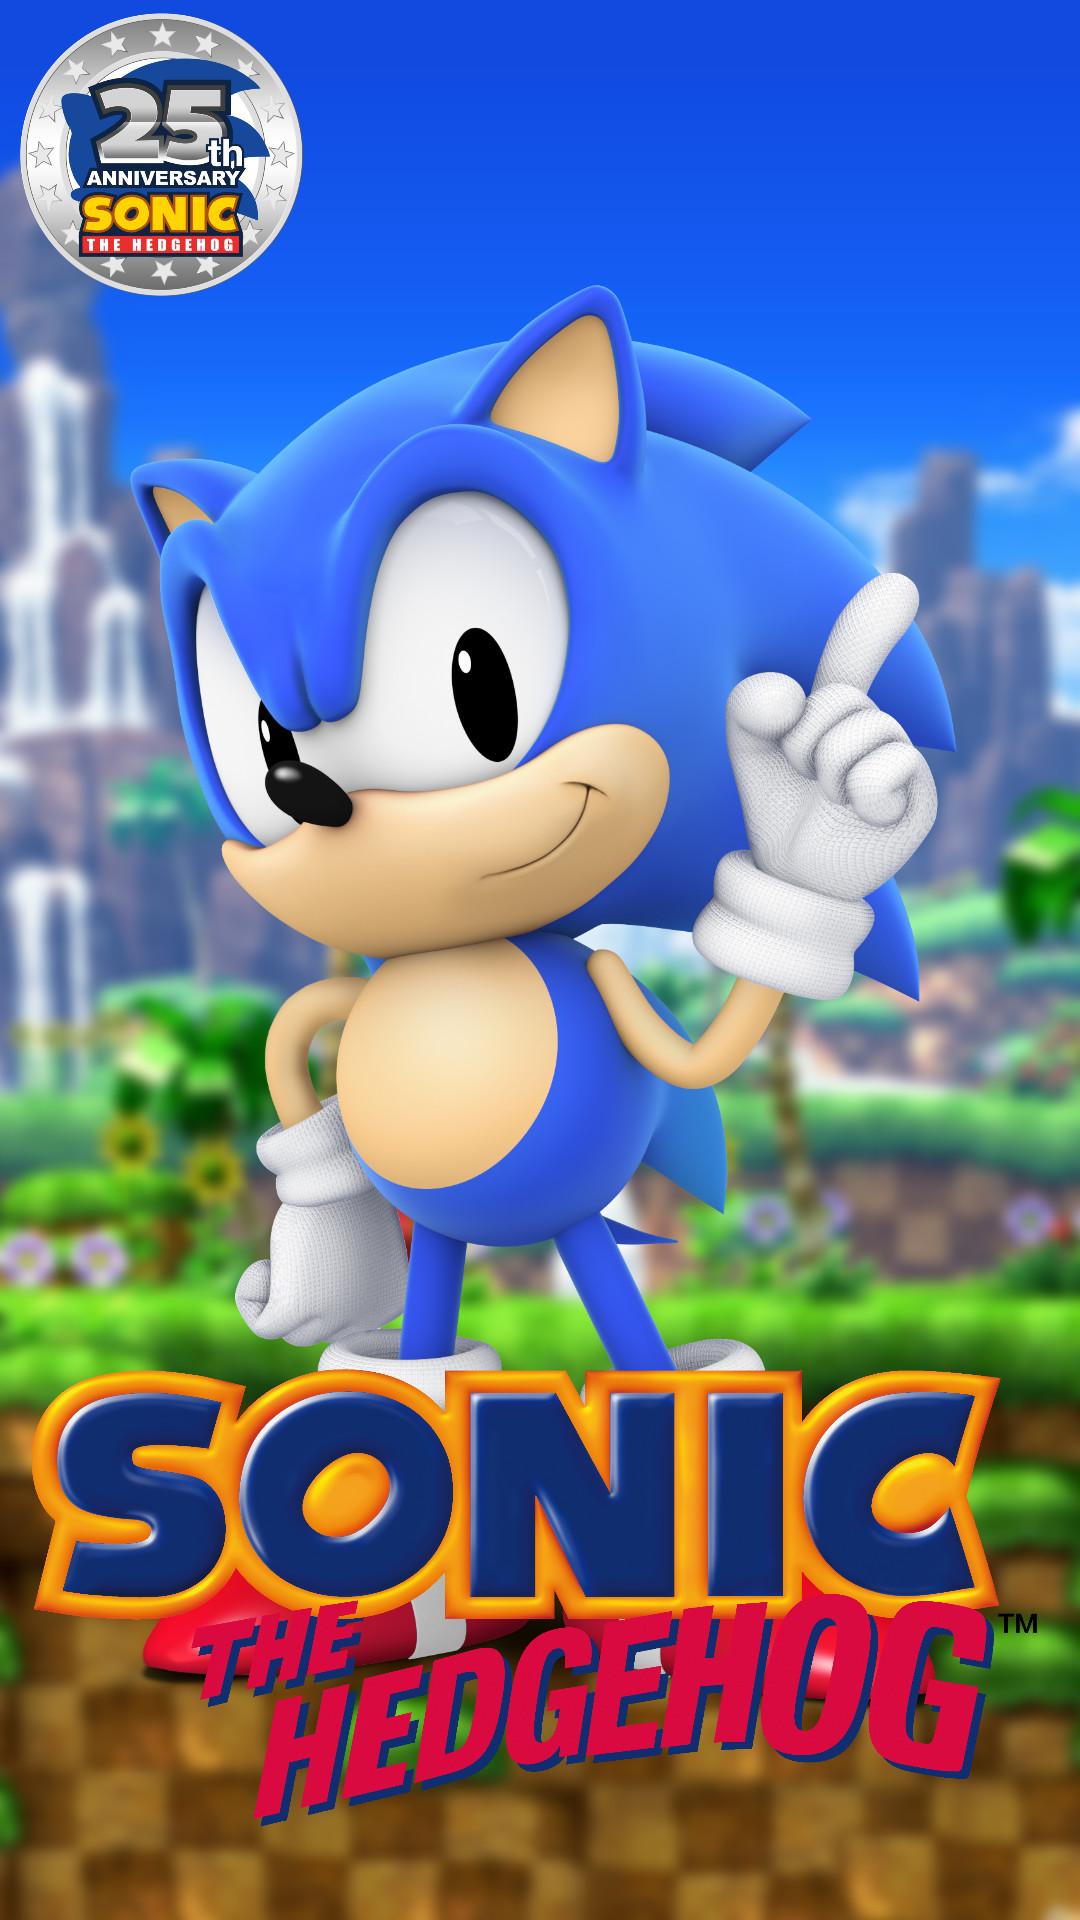 Sonic Phone Wallpaper